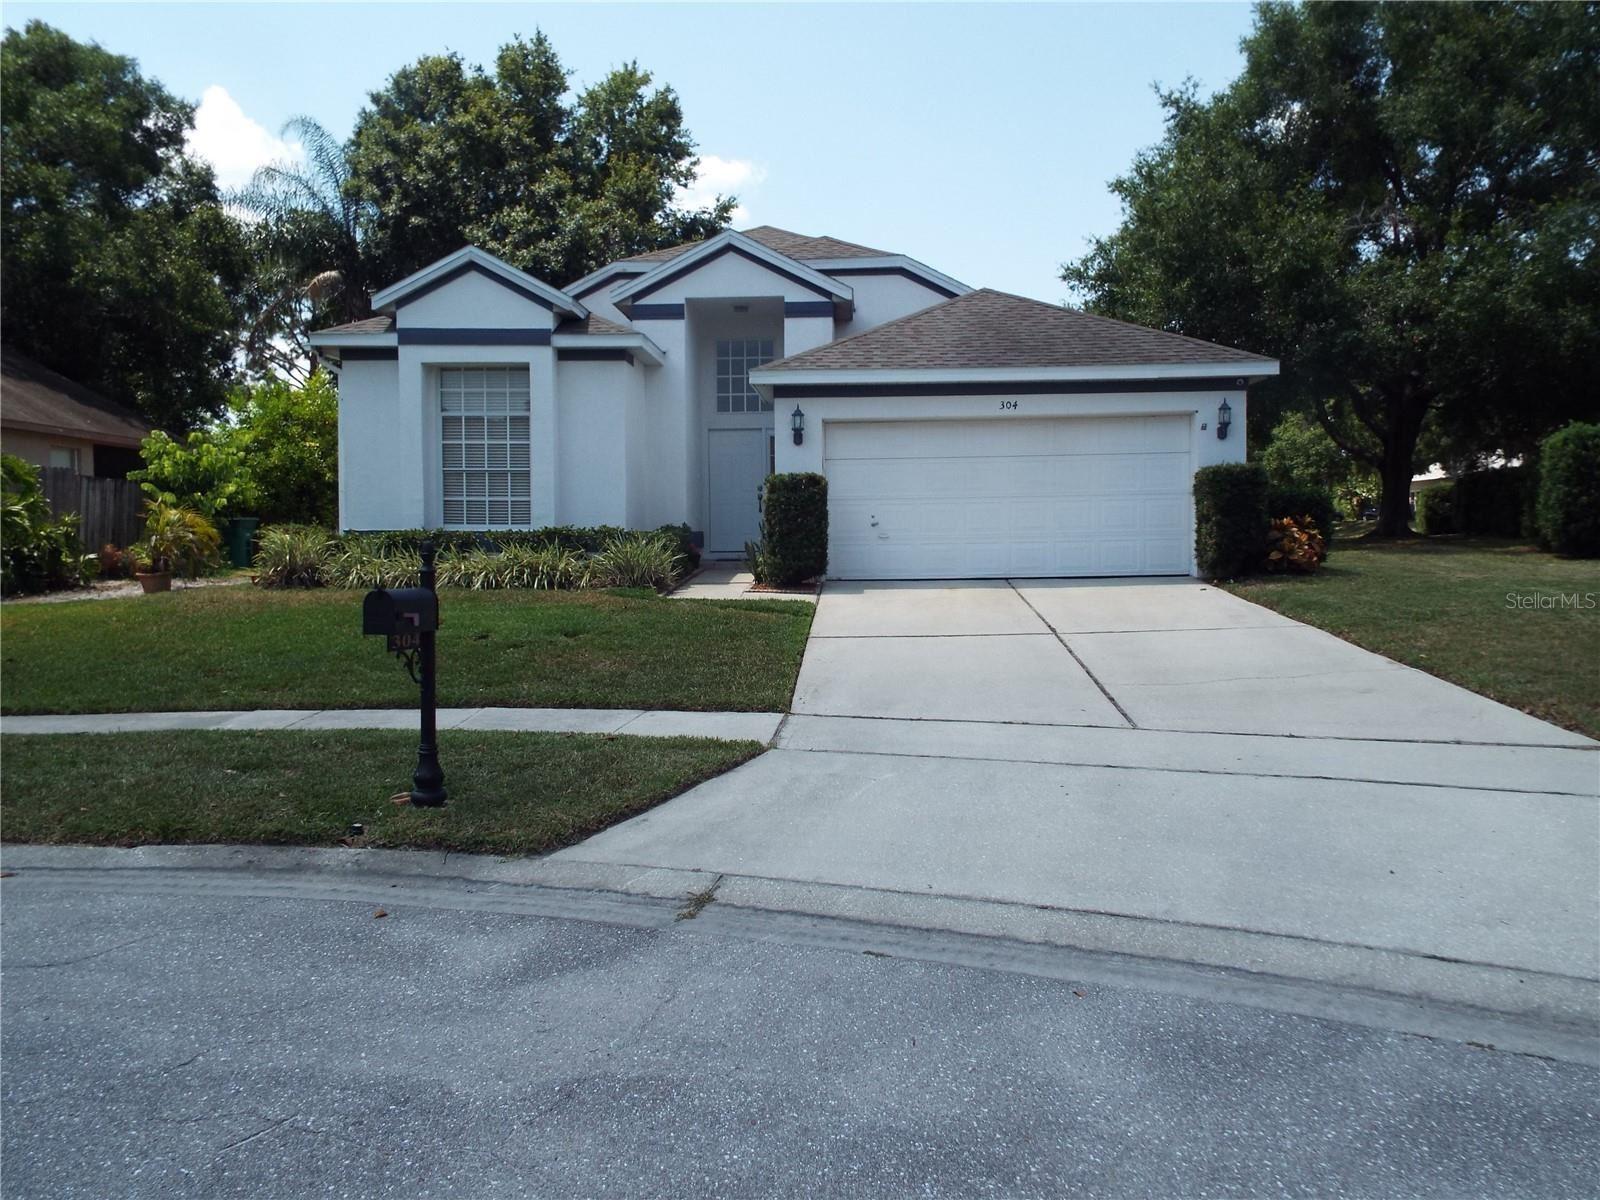 304 BALOGH PLACE, Longwood, FL 32750 - MLS#: A4504450